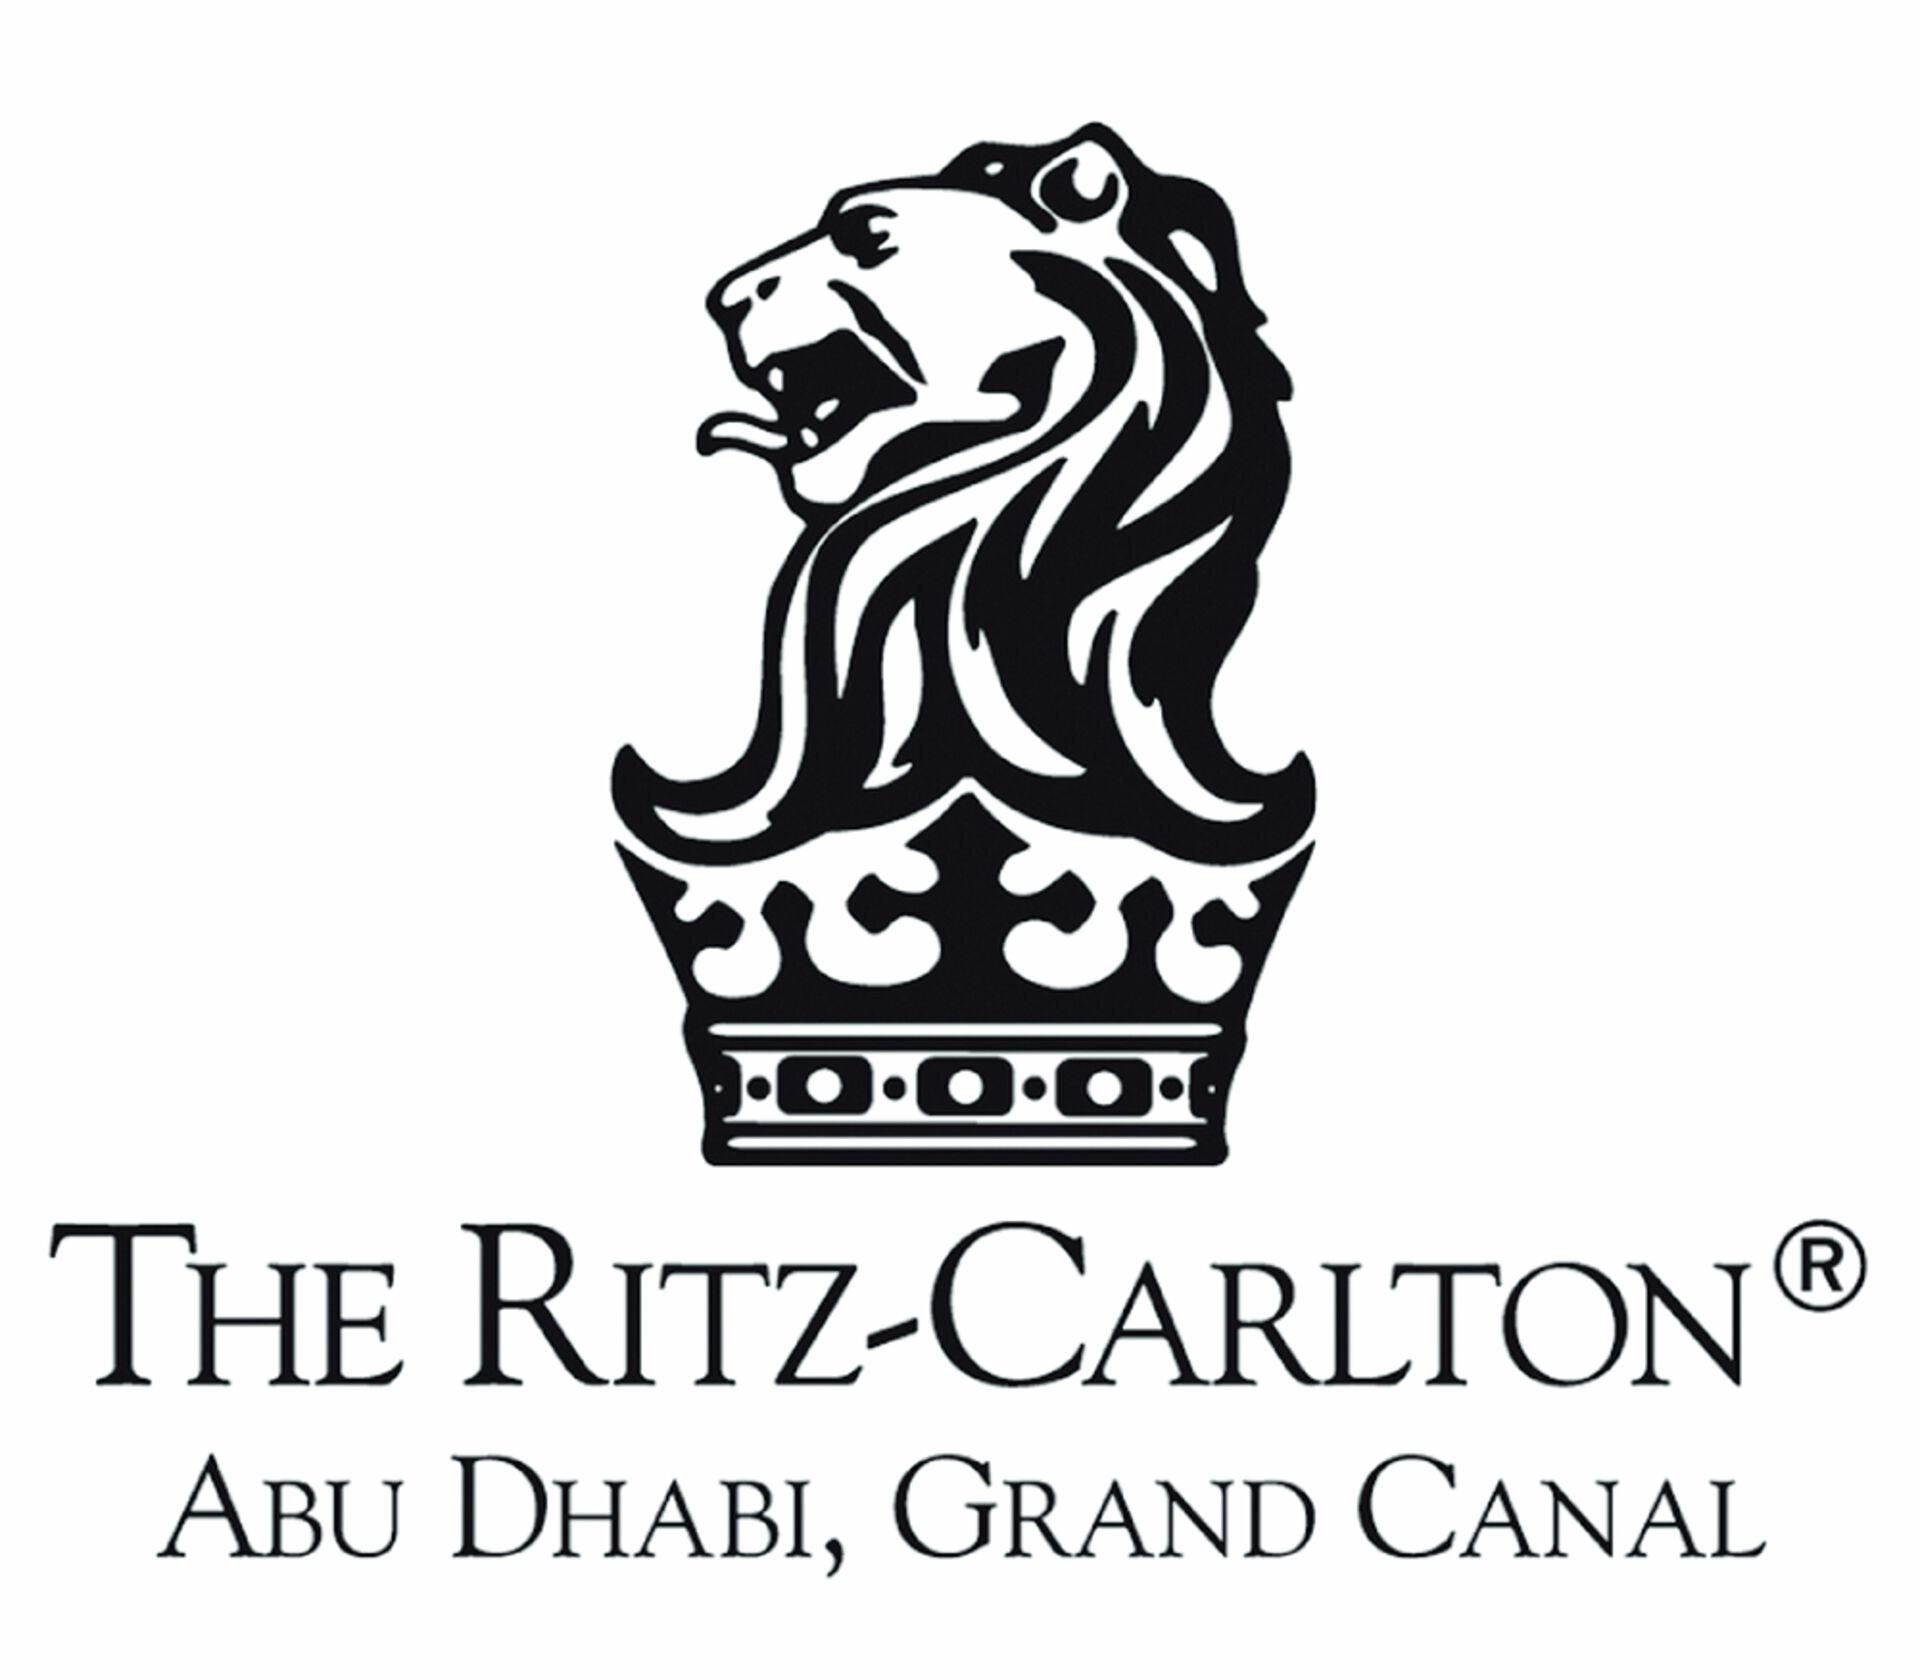 Hôtel the ritz-carlton abu dhabi grand canal 5*